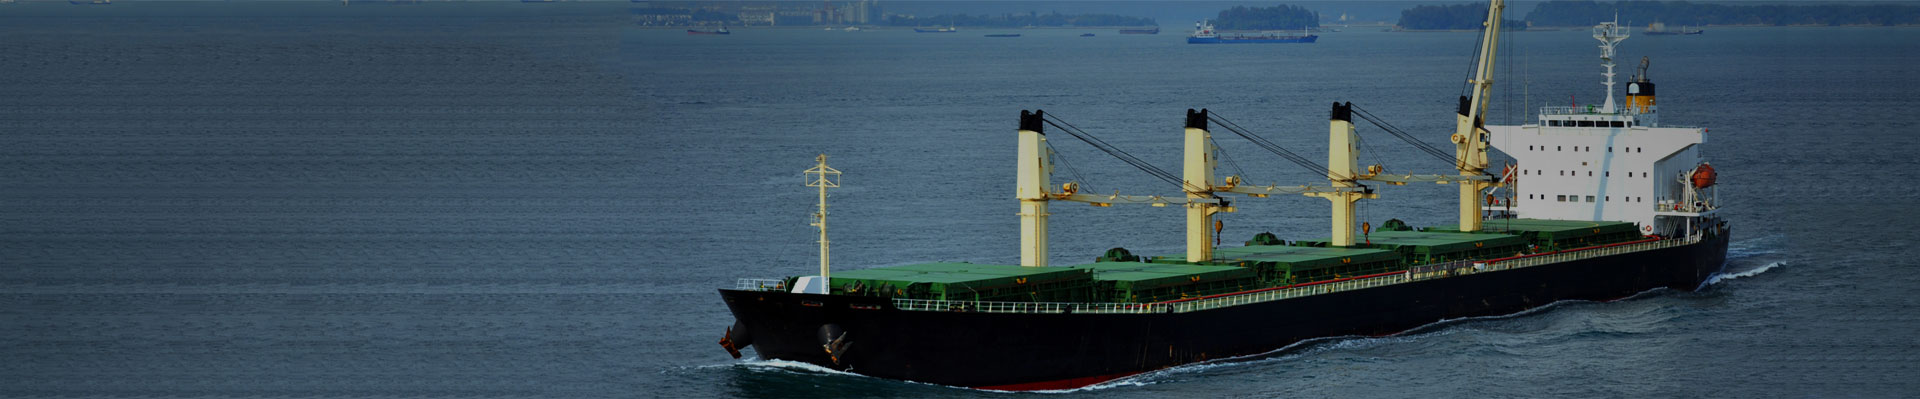 TMILL - Best International Shipping Service Provider